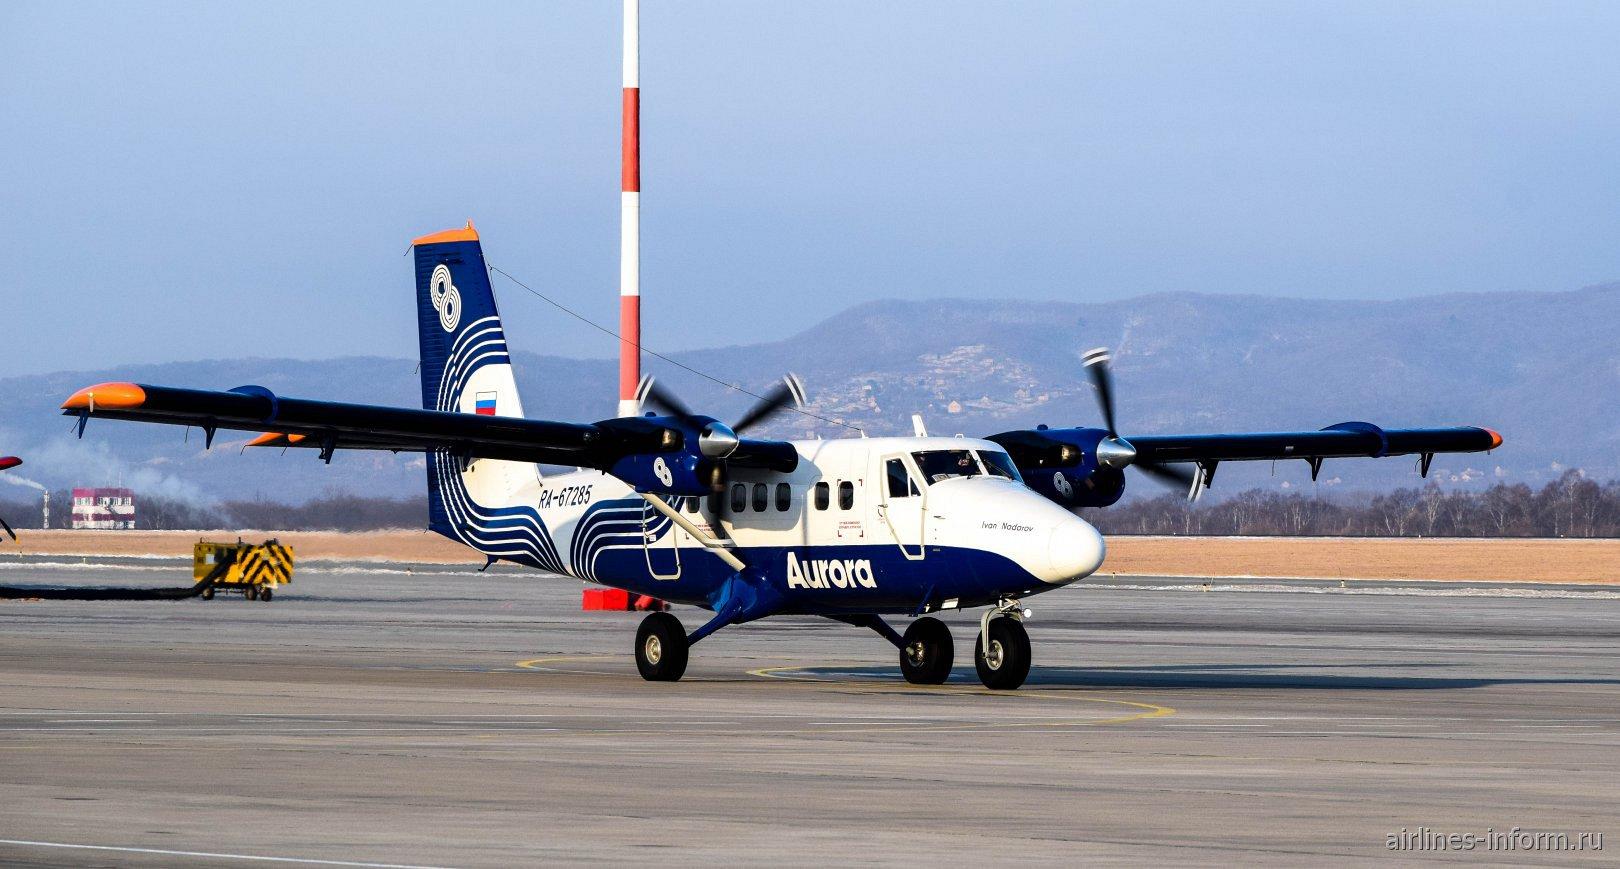 Самолет DHC-6-400 Twin Otter RA-67285 авиакомпании